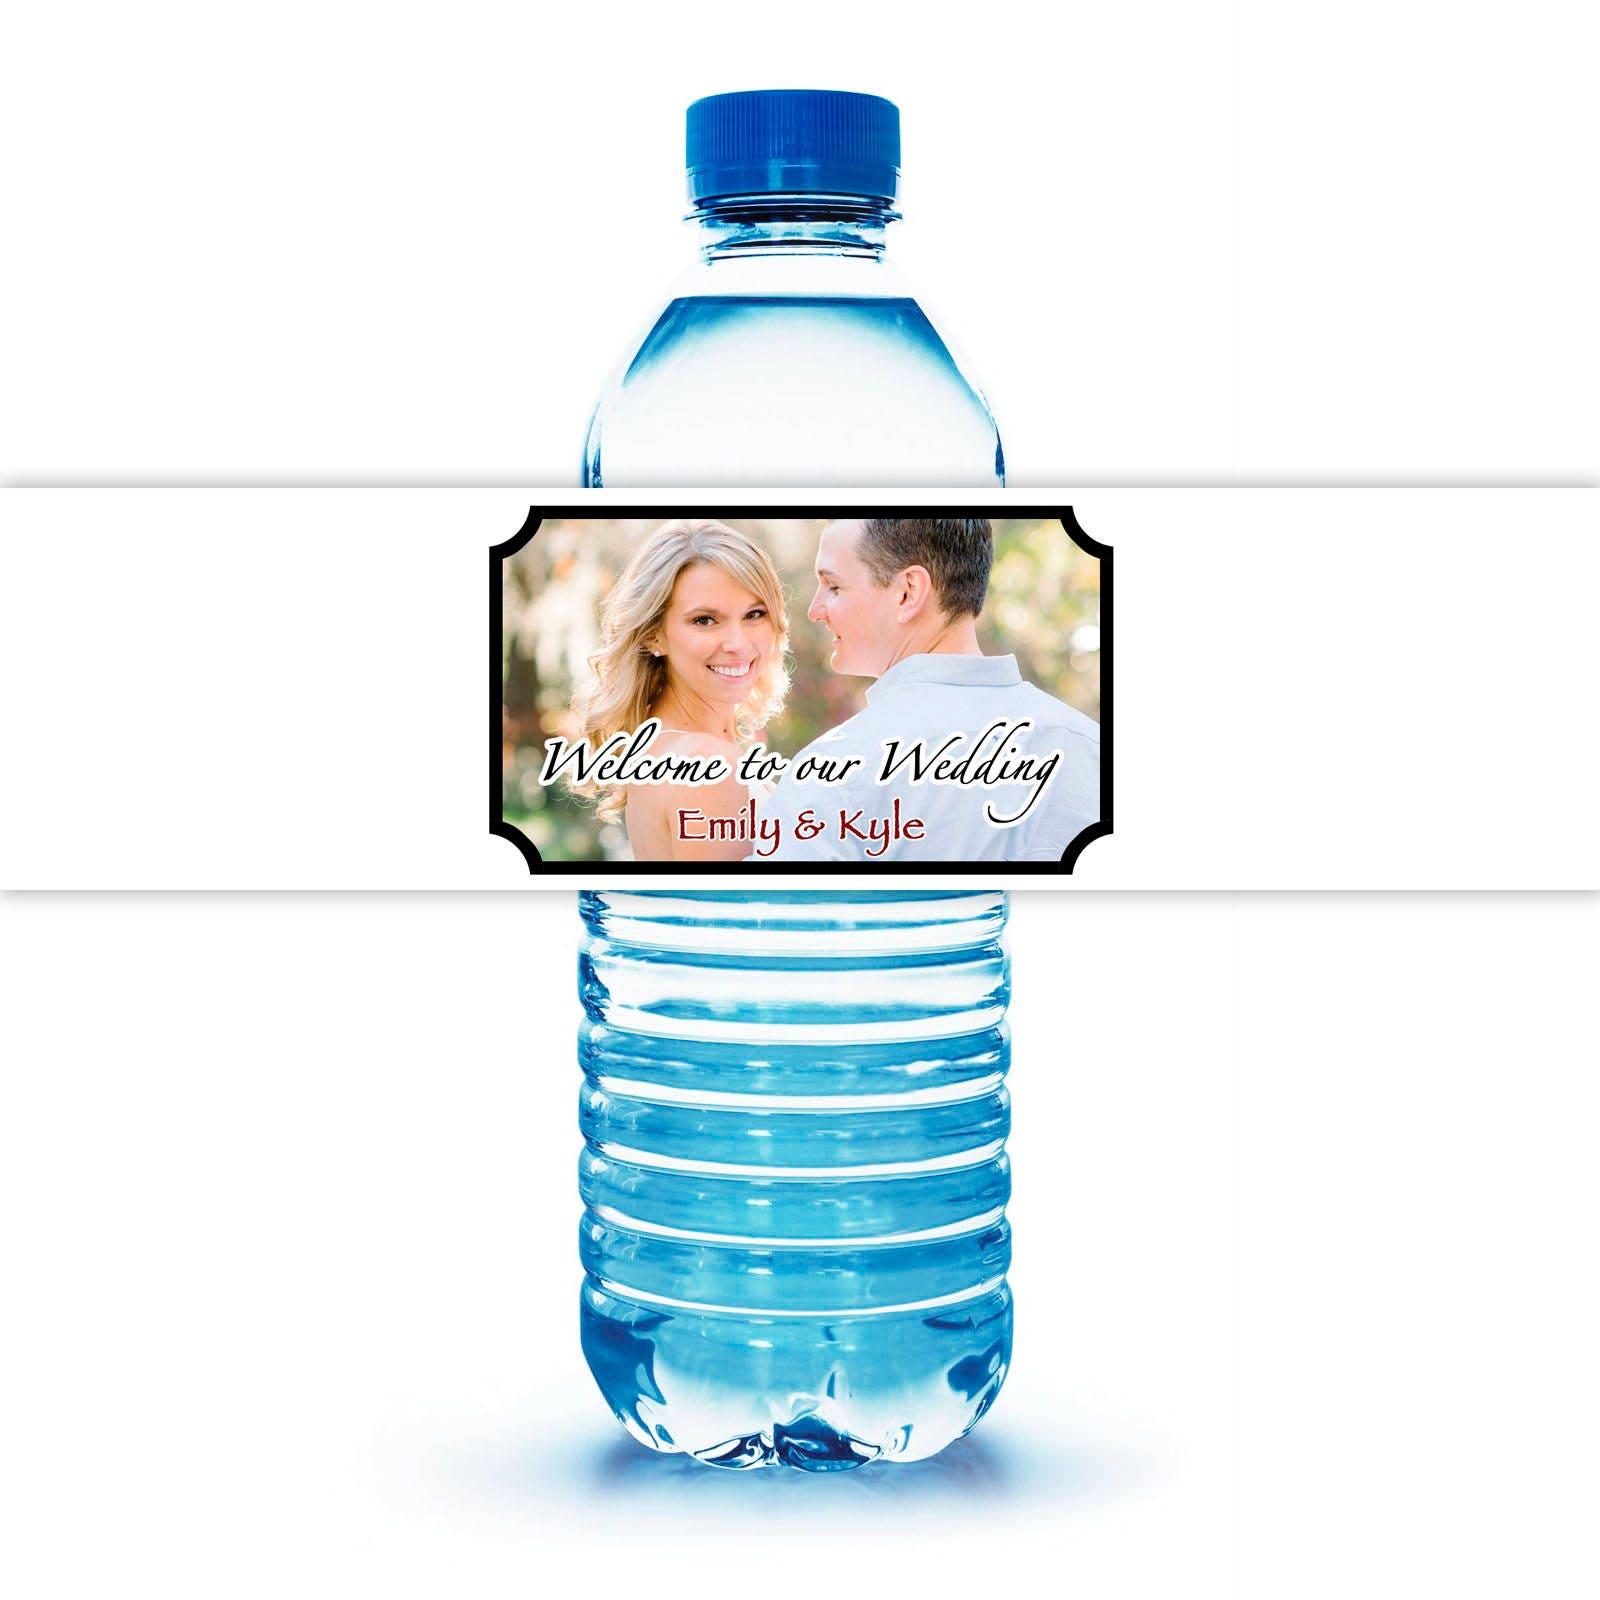 Water Bottle Kenya: Custom Designed Water Bottle Labels And Personalized